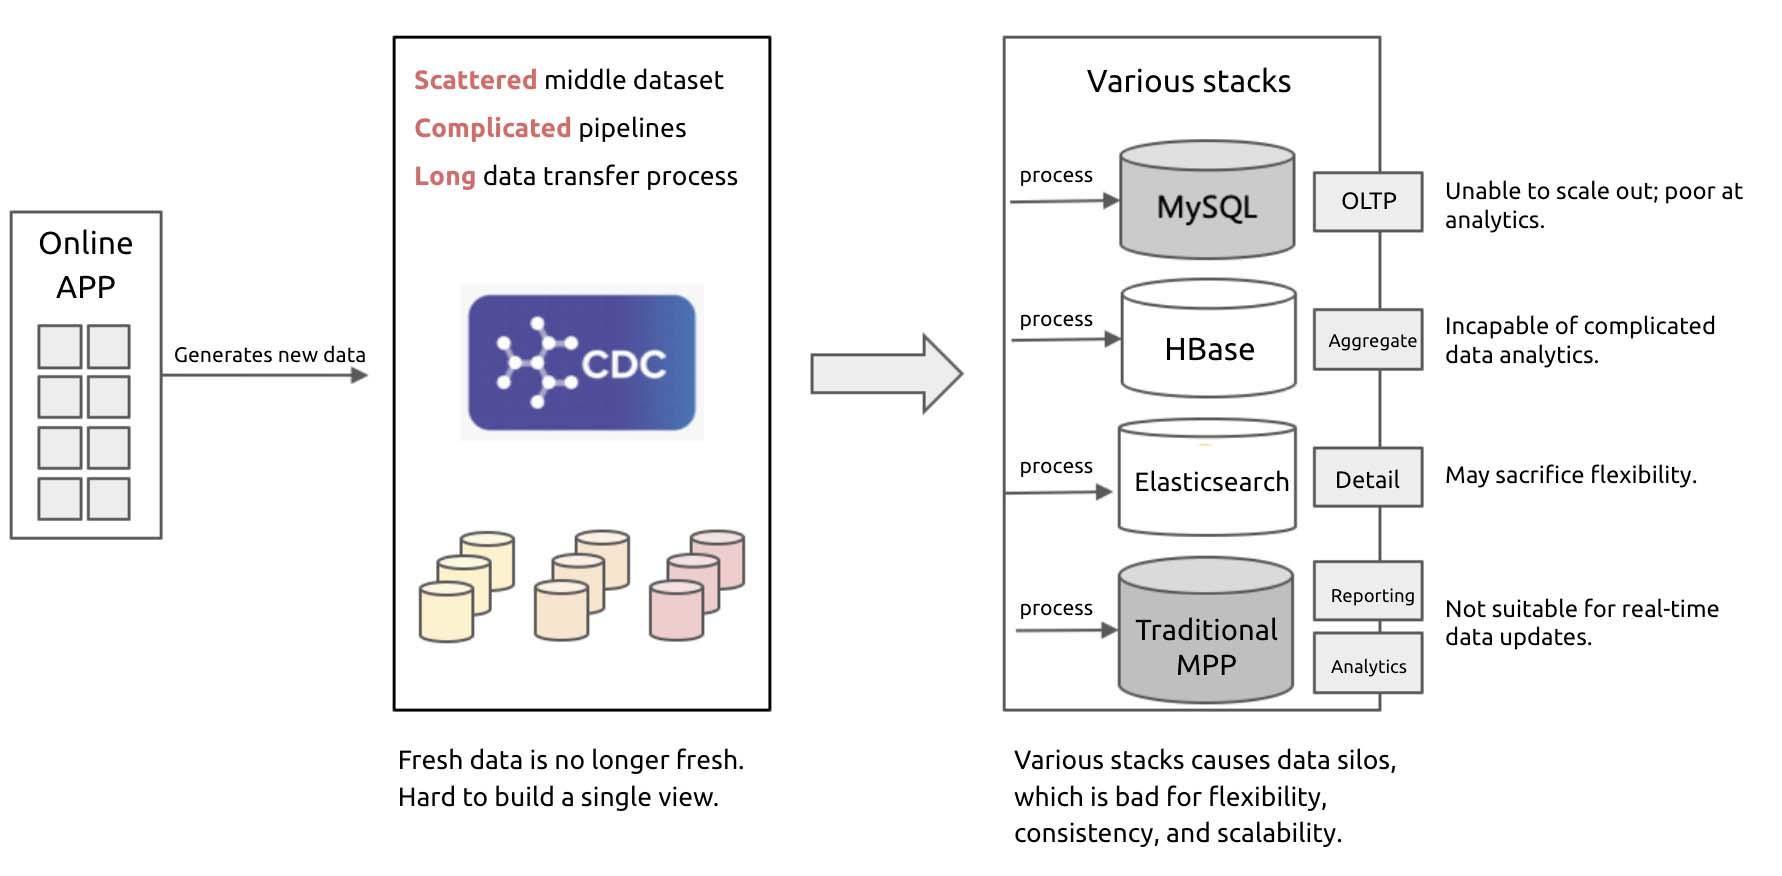 A traditional stream computing scenario